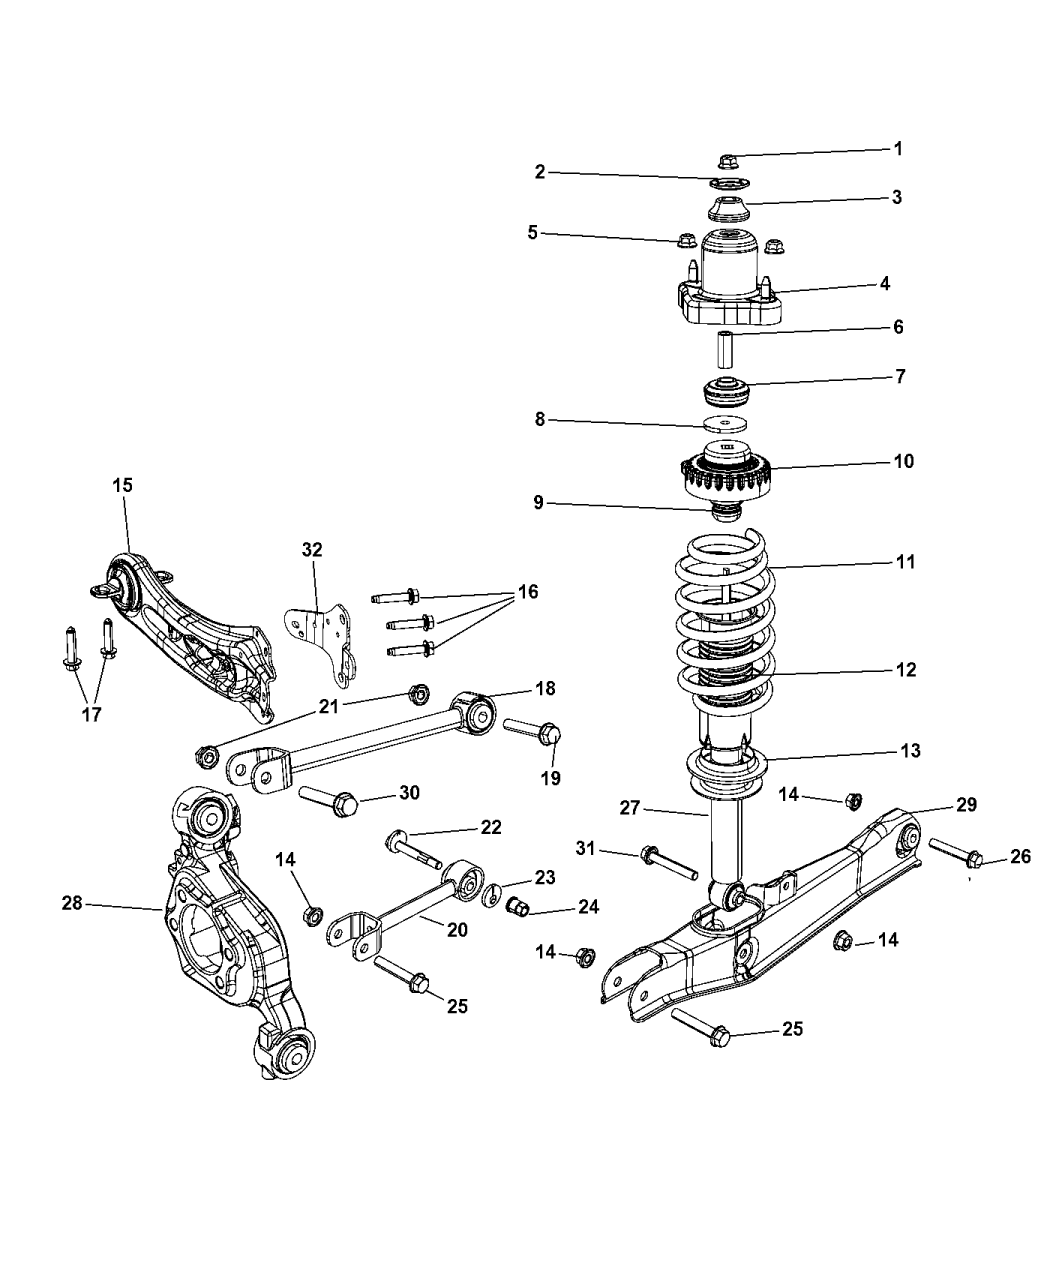 2012 dodge avenger suspension - rear